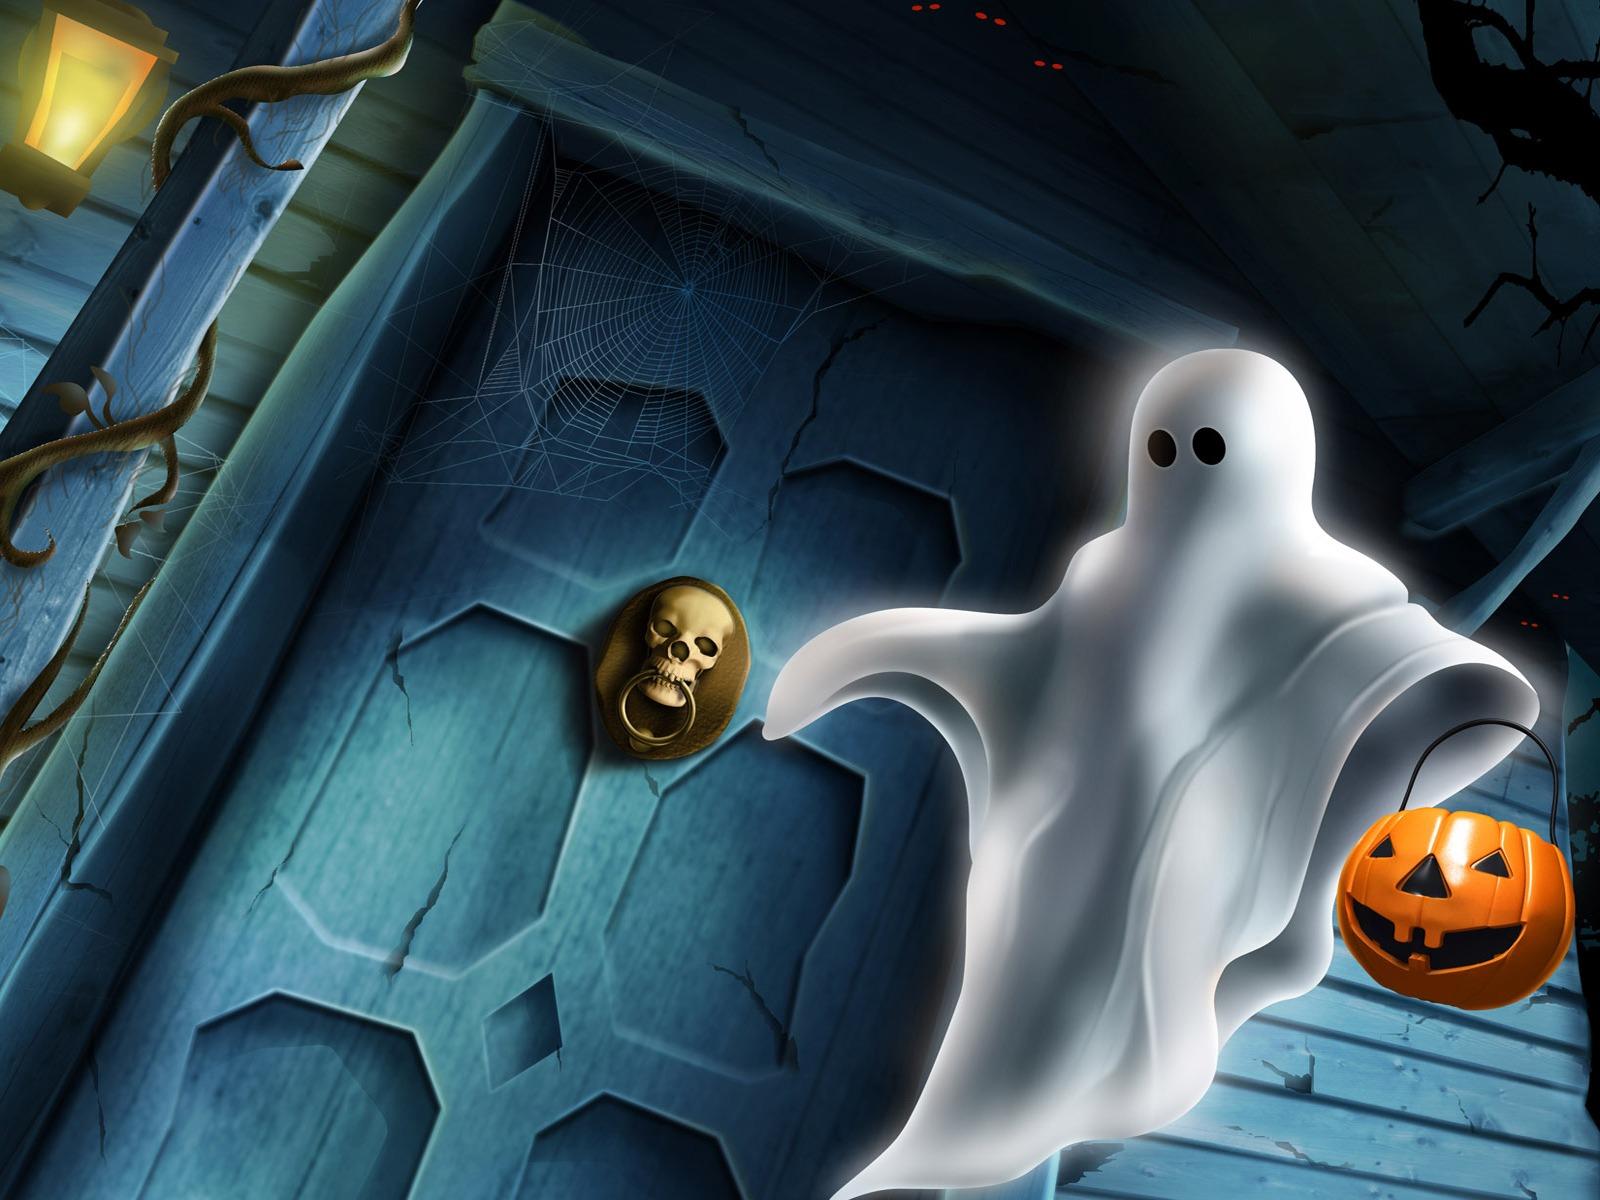 1600x1200 Halloween ghost desktop PC and Mac wallpaper 1600x1200